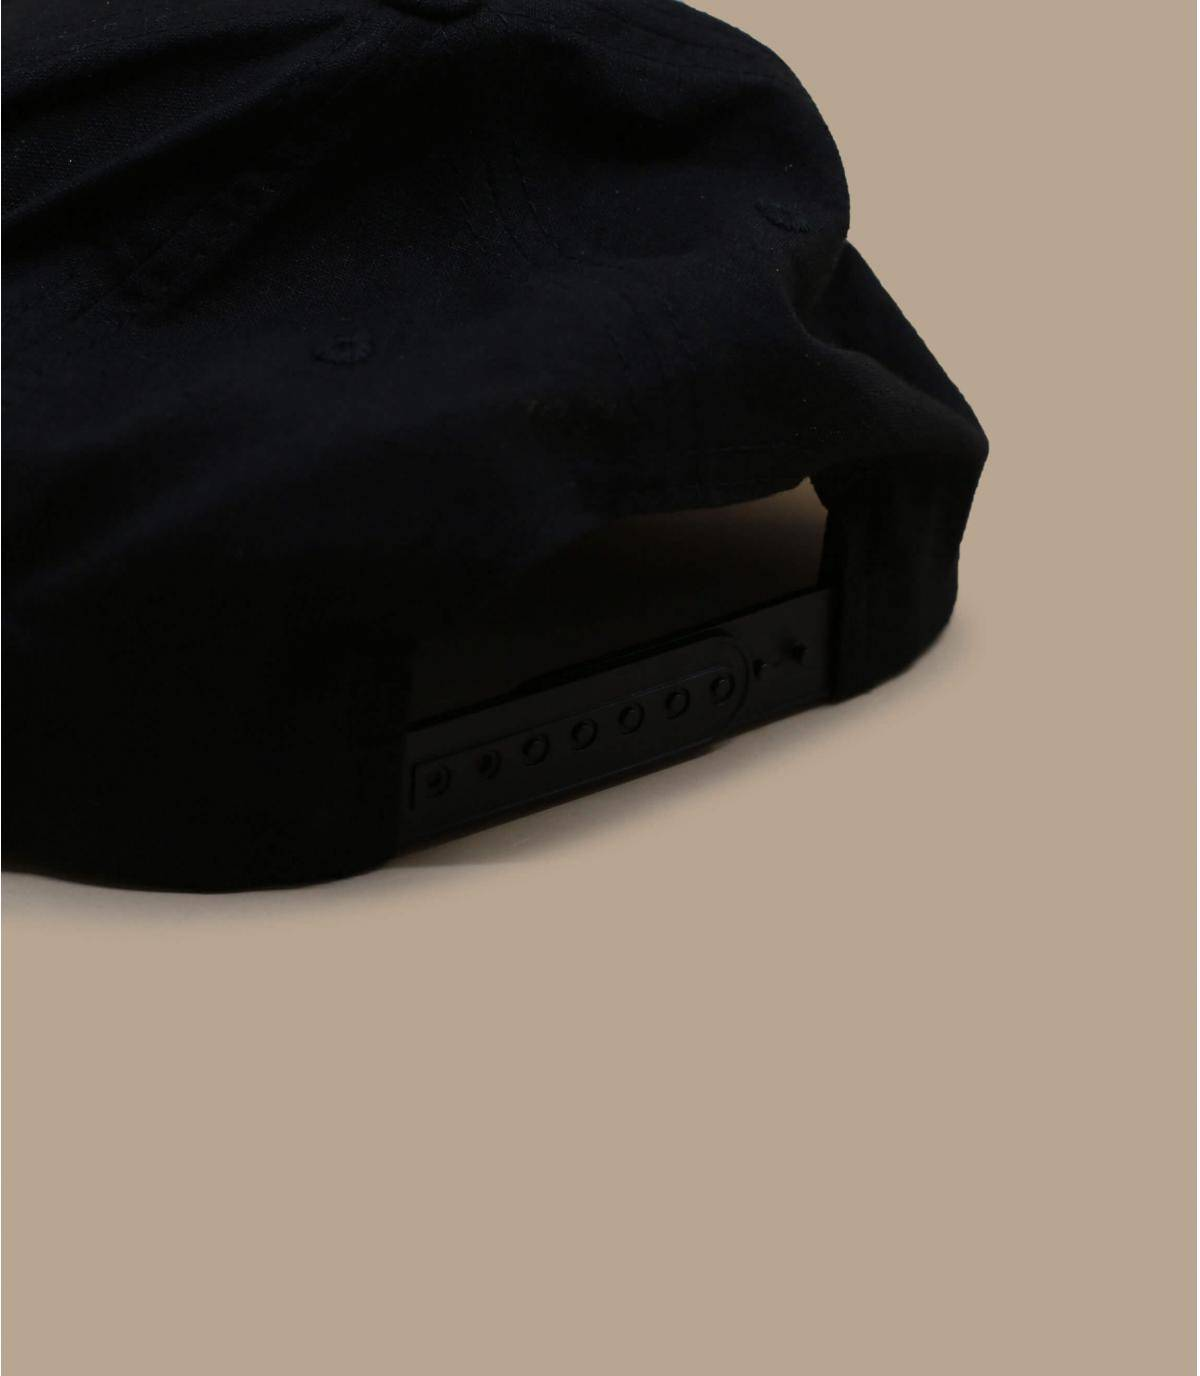 Detalles New Wave black imagen 4